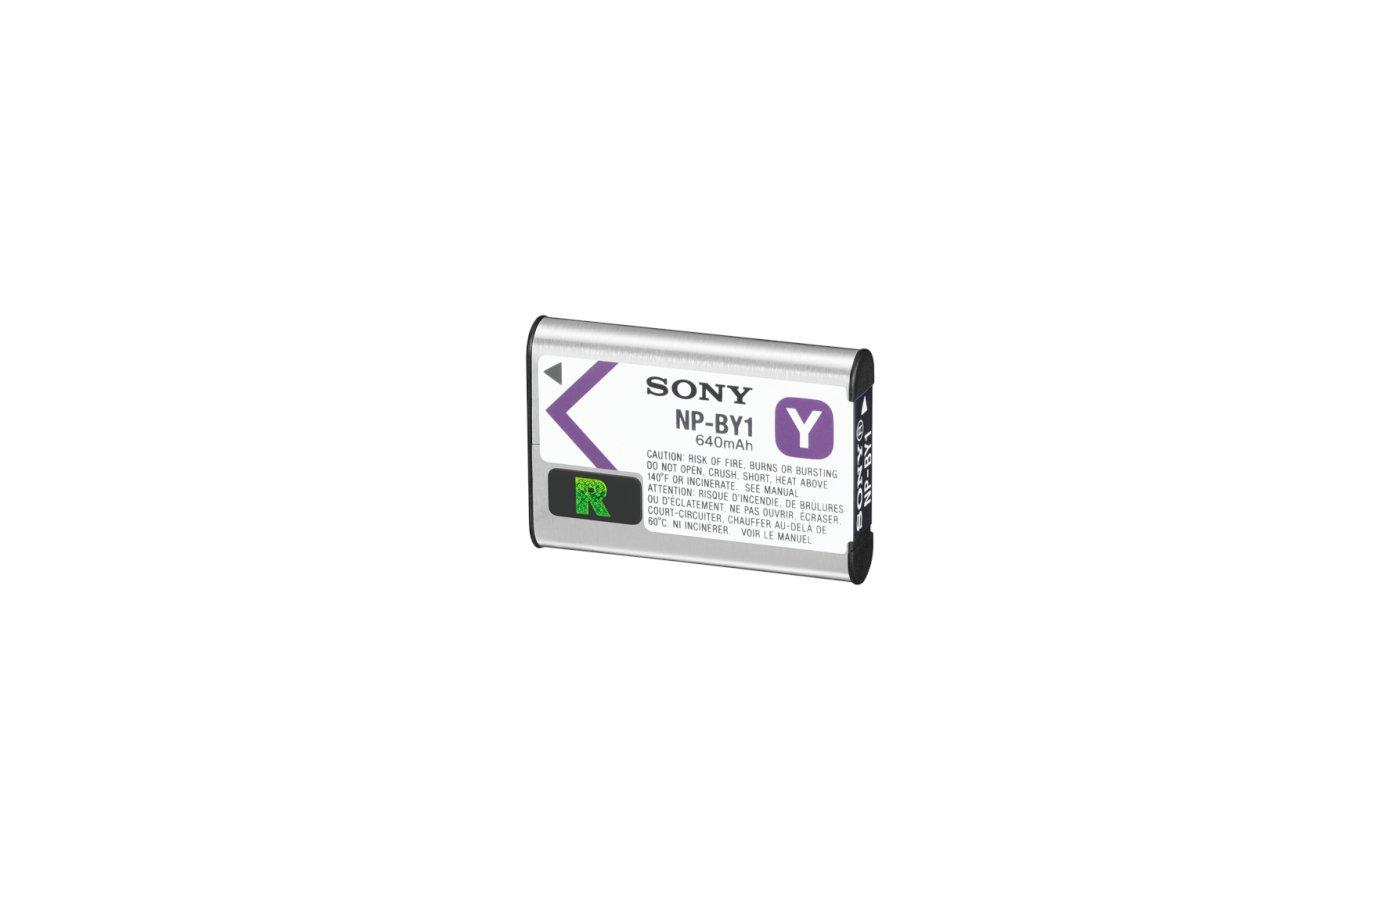 SONY NP-BY1 Аккумулятор типа Y для HDR-AZ1